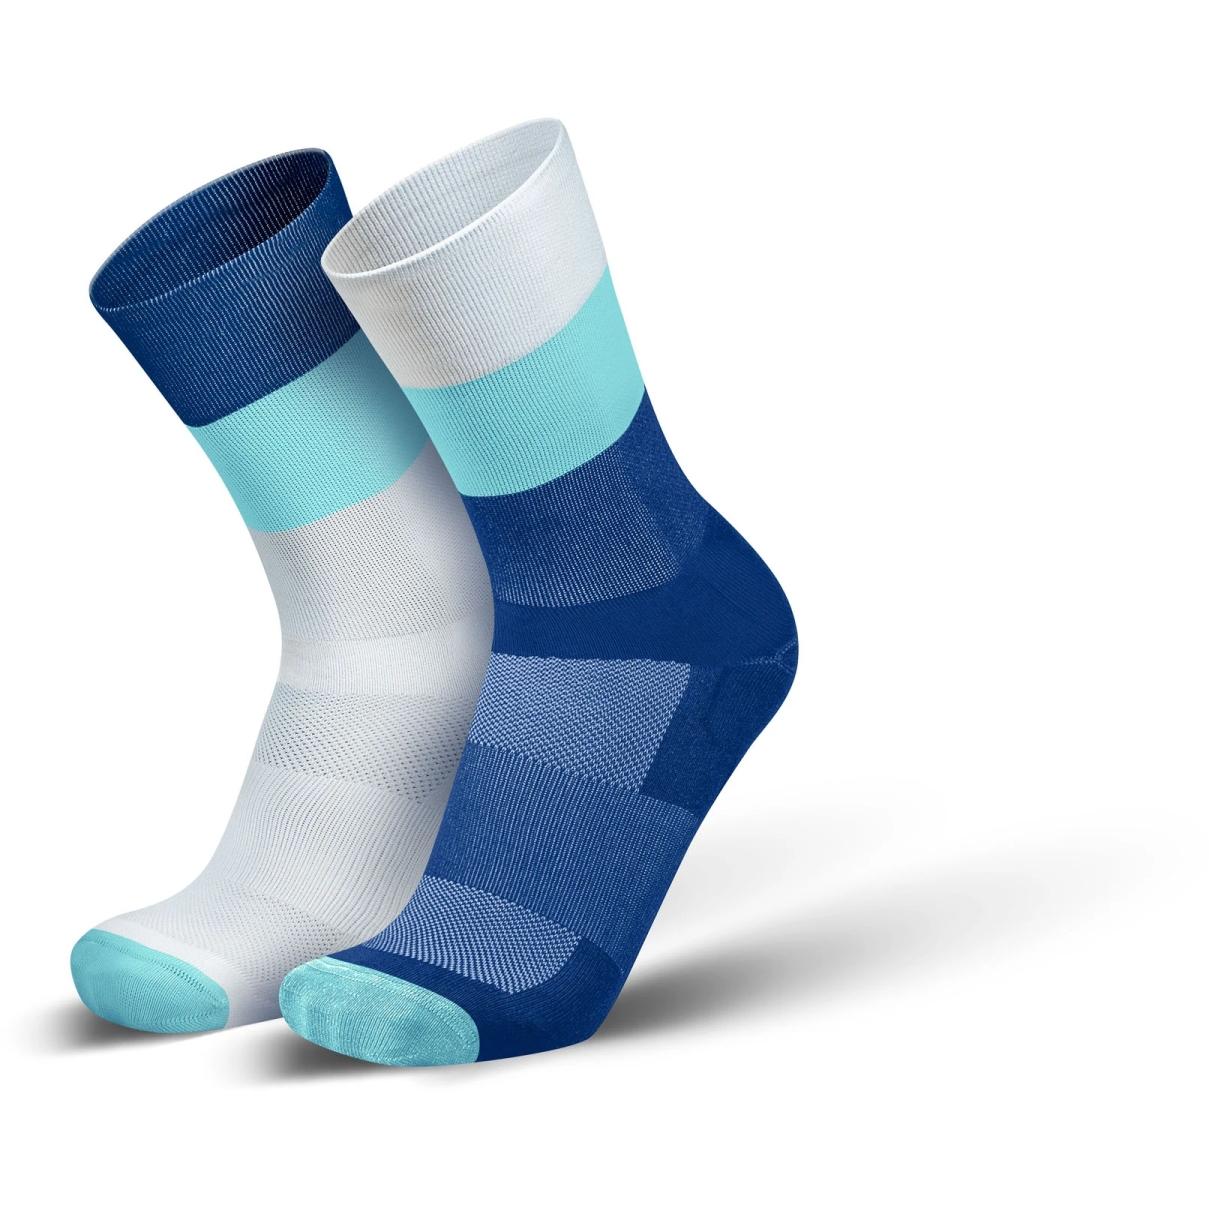 Produktbild von INCYLENCE Ultralight Mirrored Socken - Mint